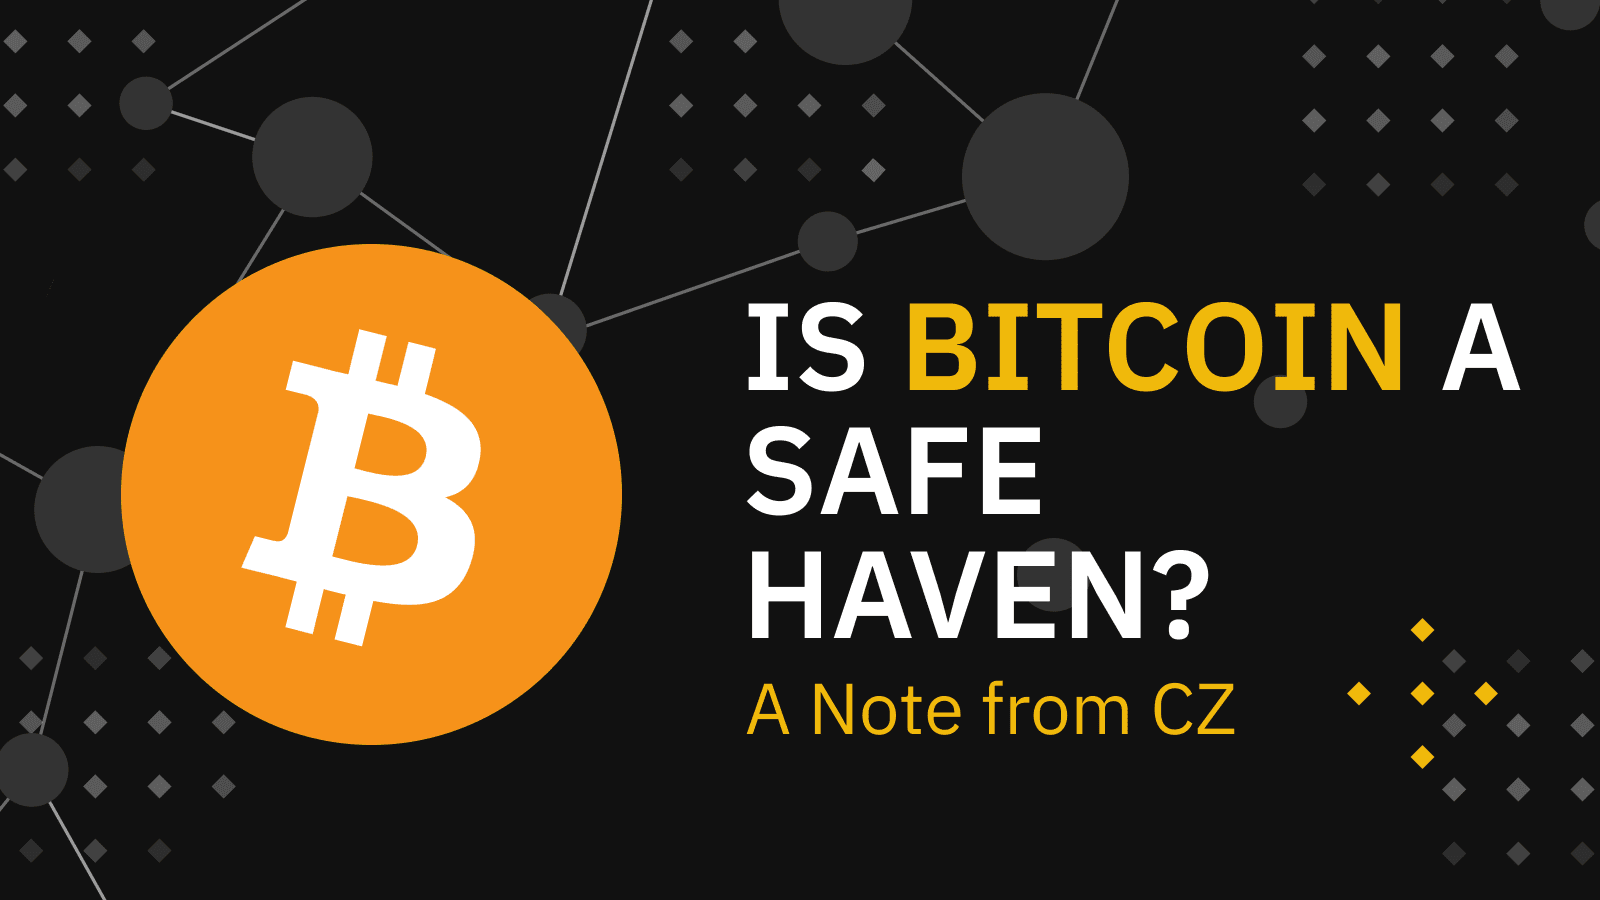 Mining bitcoins cz rechtsanwalt dr torsten bettinger company